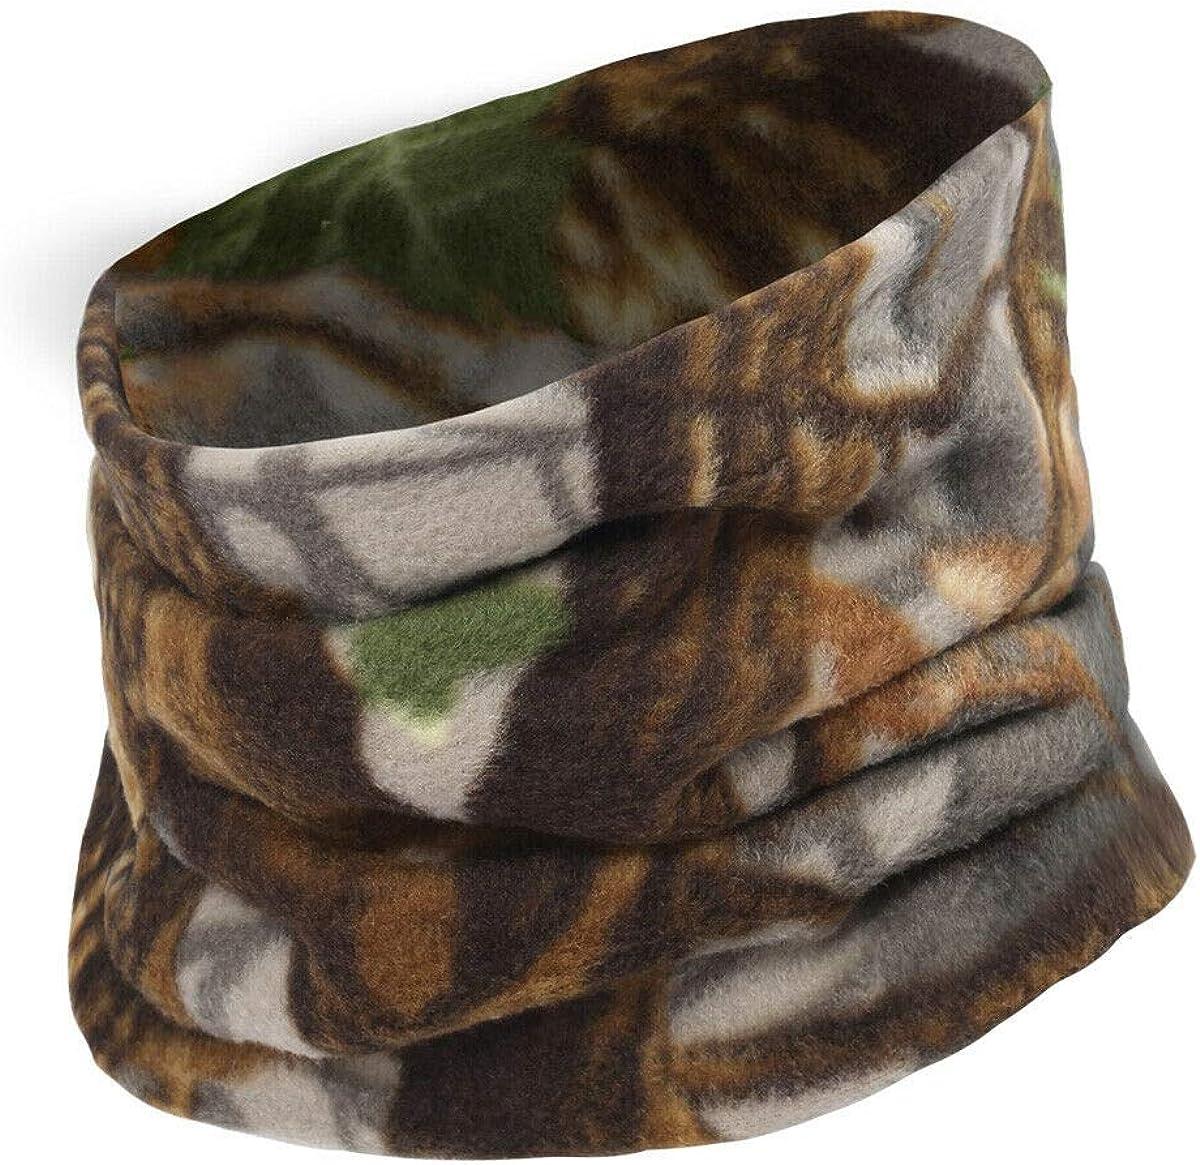 Cold Weather Fleece Neck Gaiter Camo Windproof Face Winter Neck Warmer - RC15